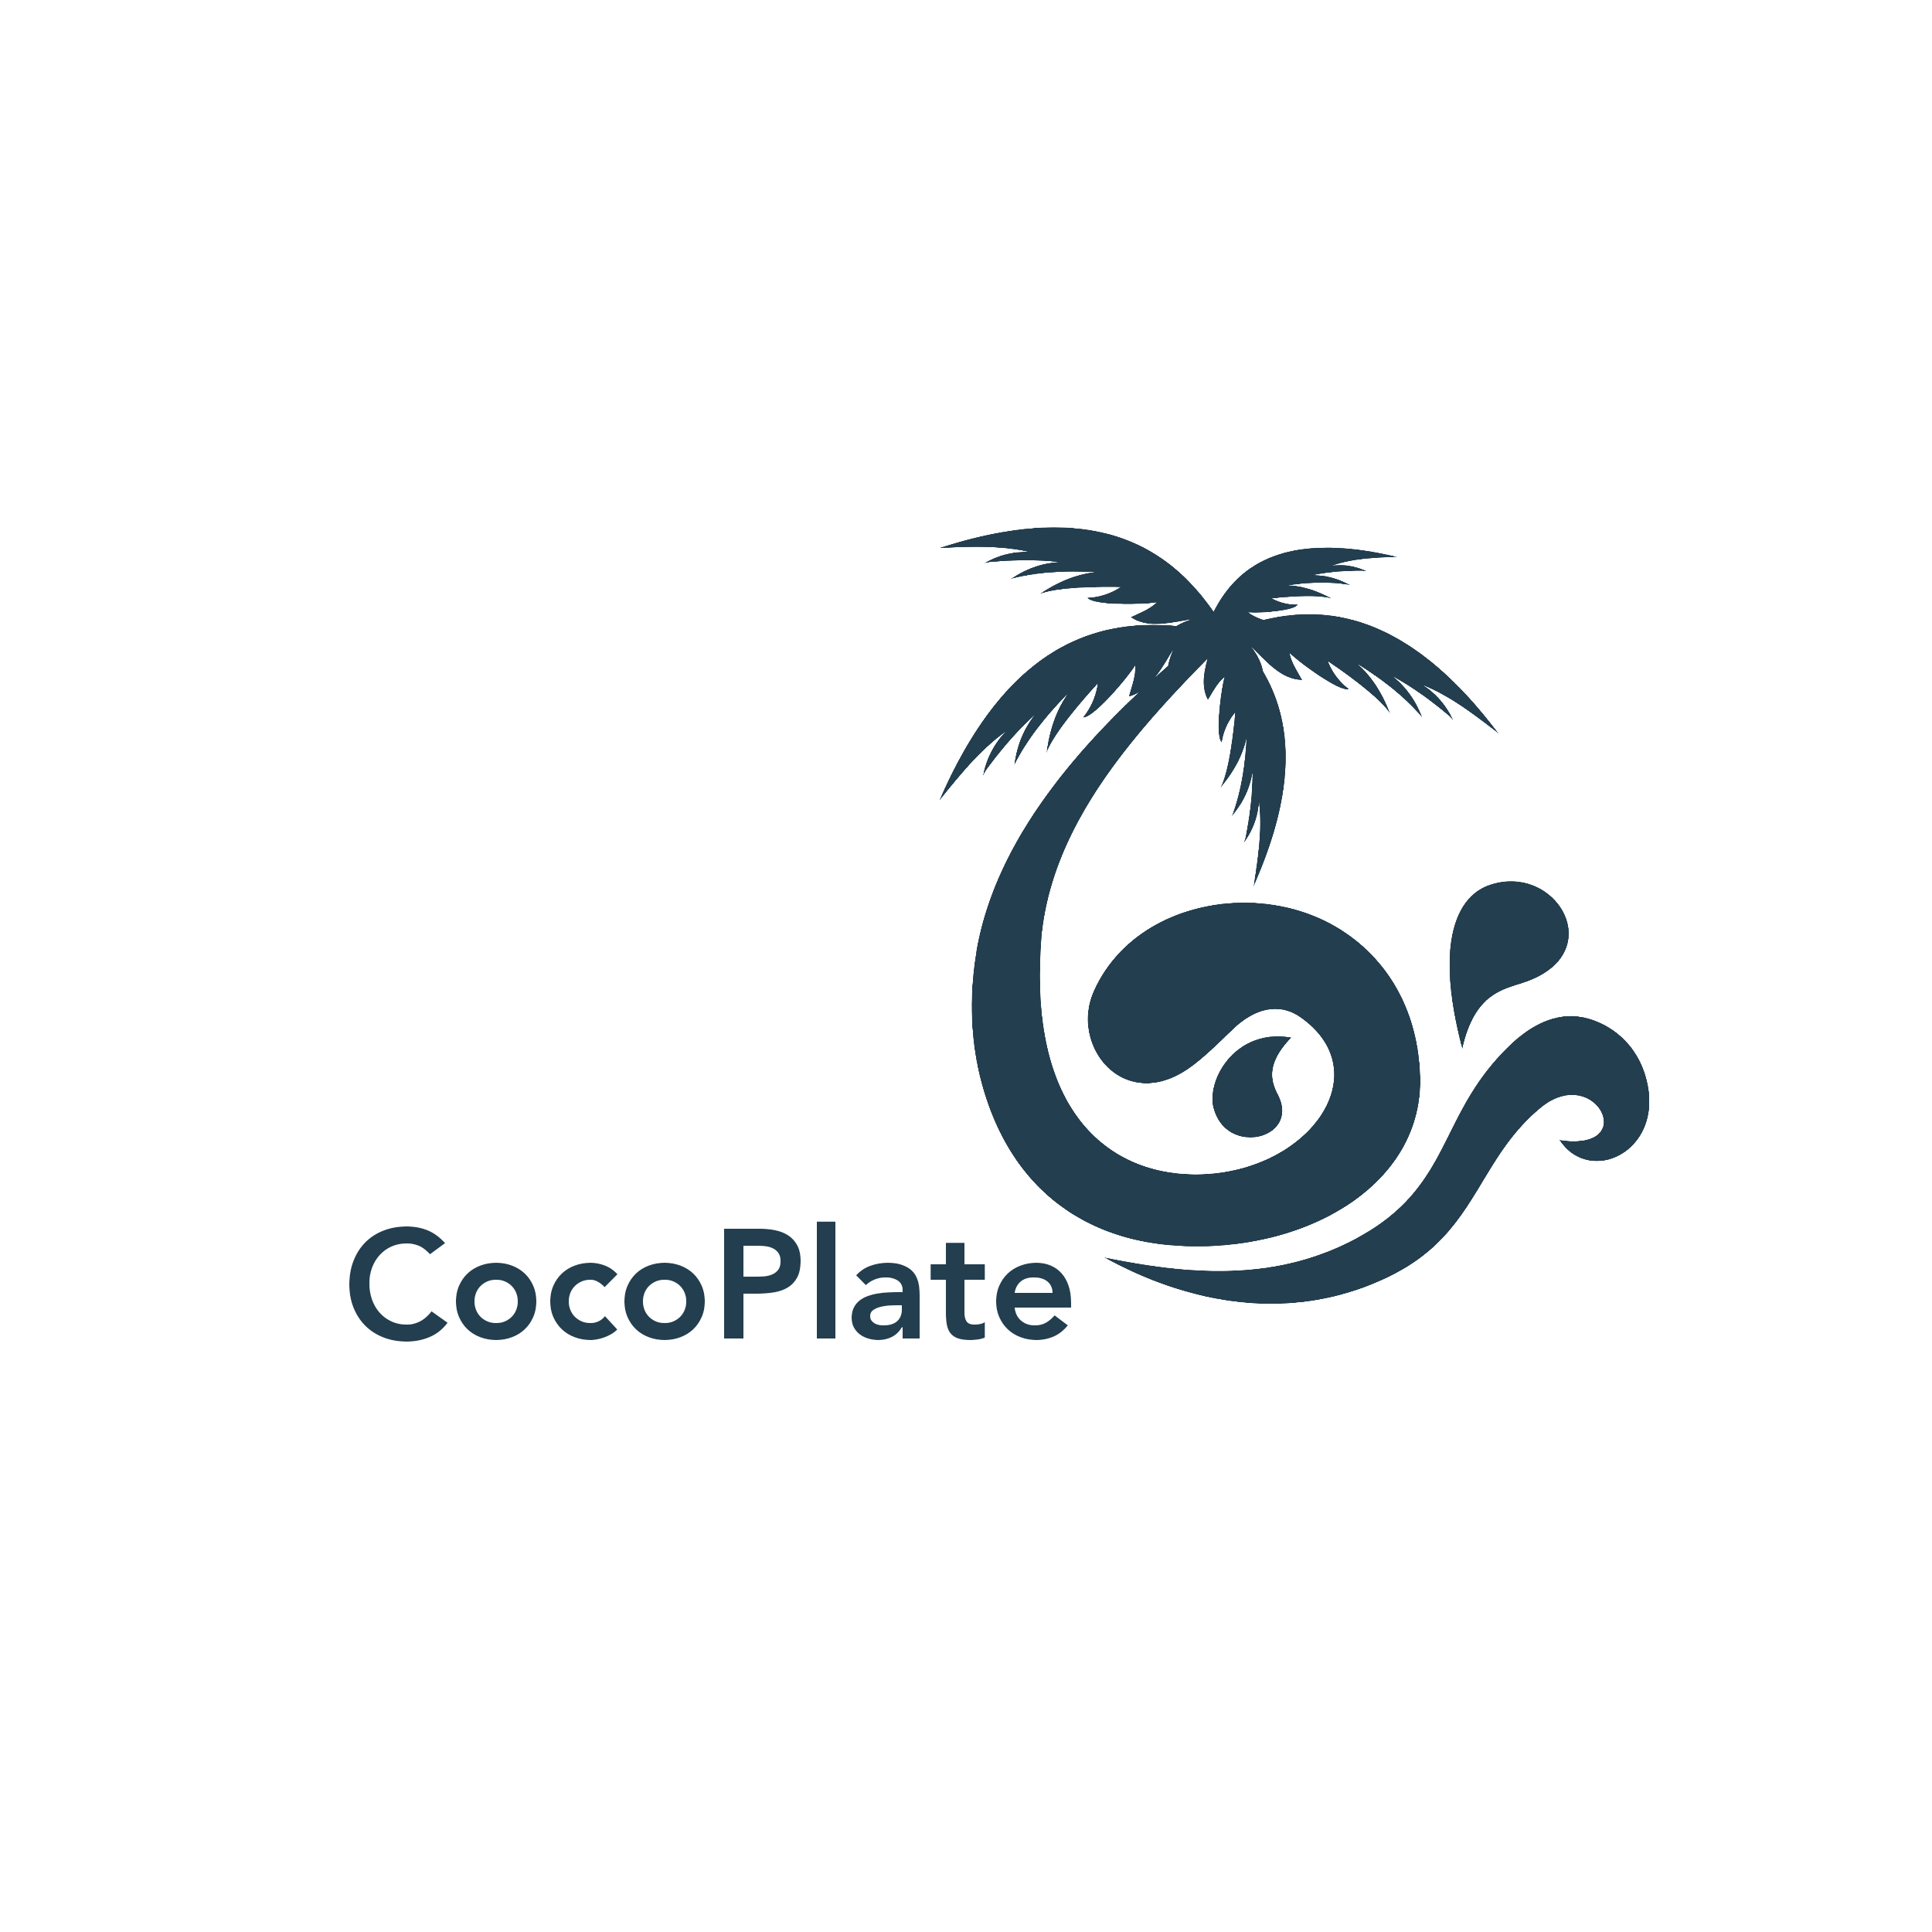 cocoPlate logo